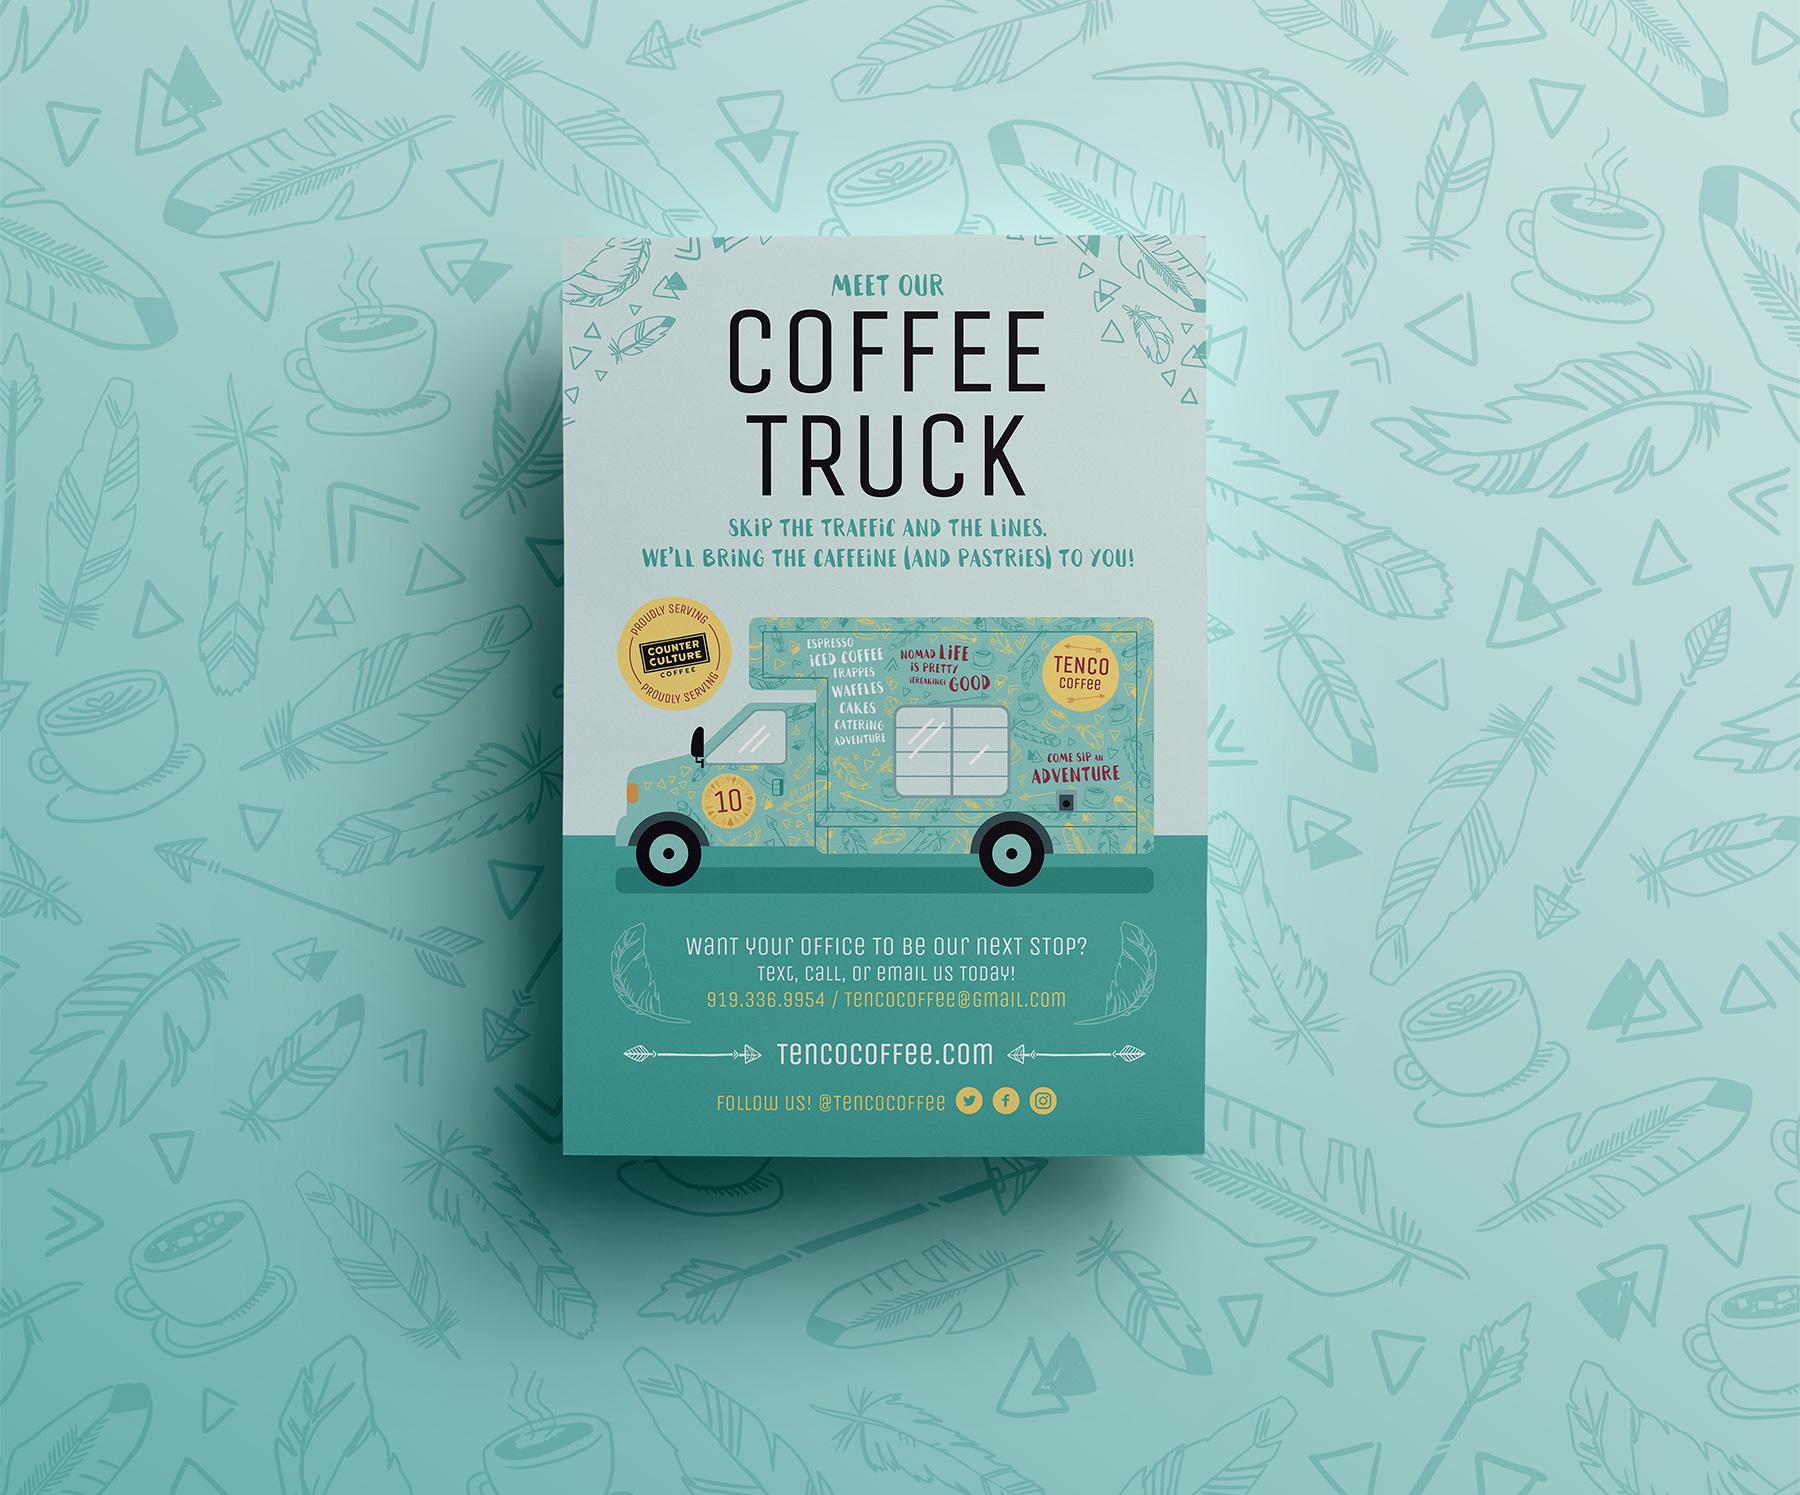 Carole_Chevalier-Tenco-Coffee-4.jpg